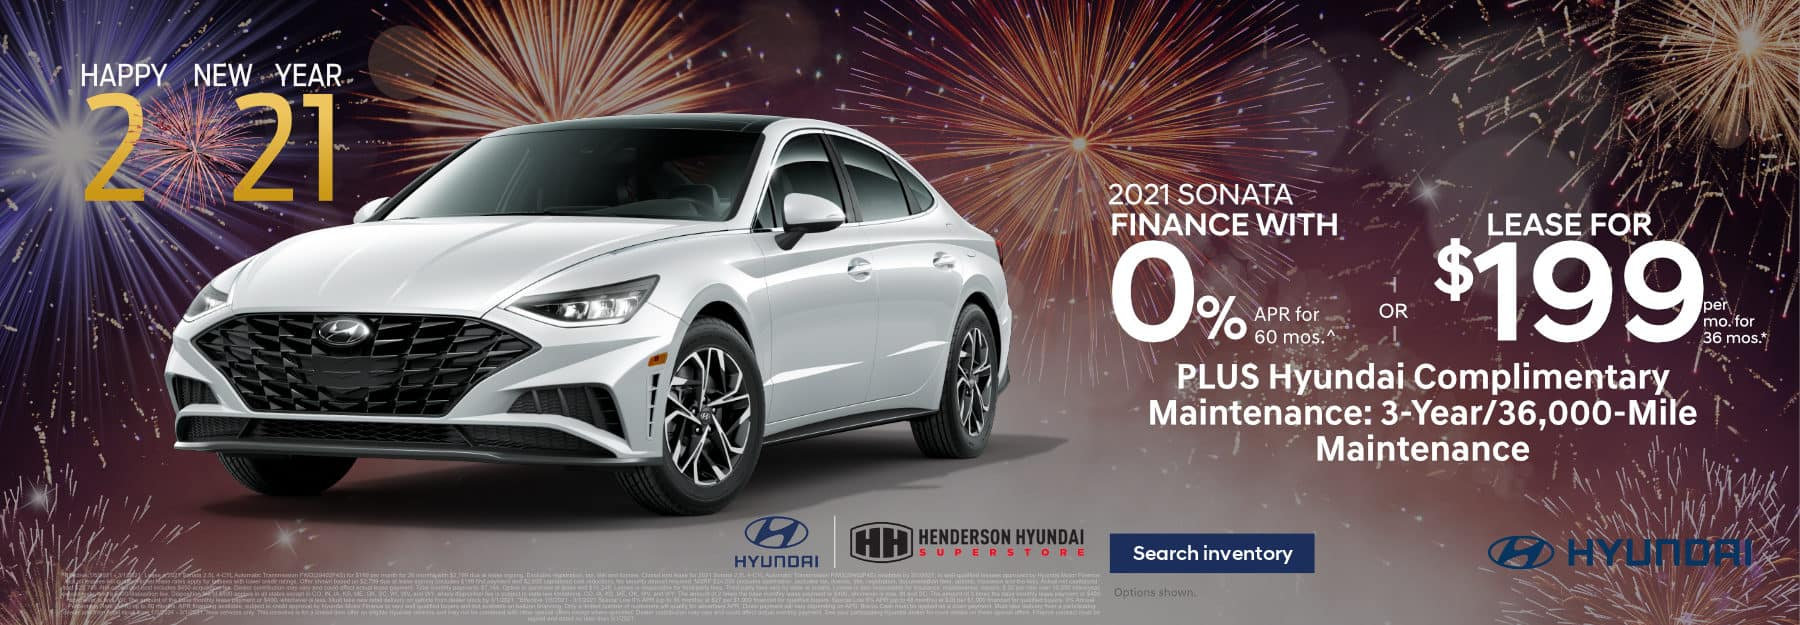 January_2021_Sonata_Henderson_Hyundai